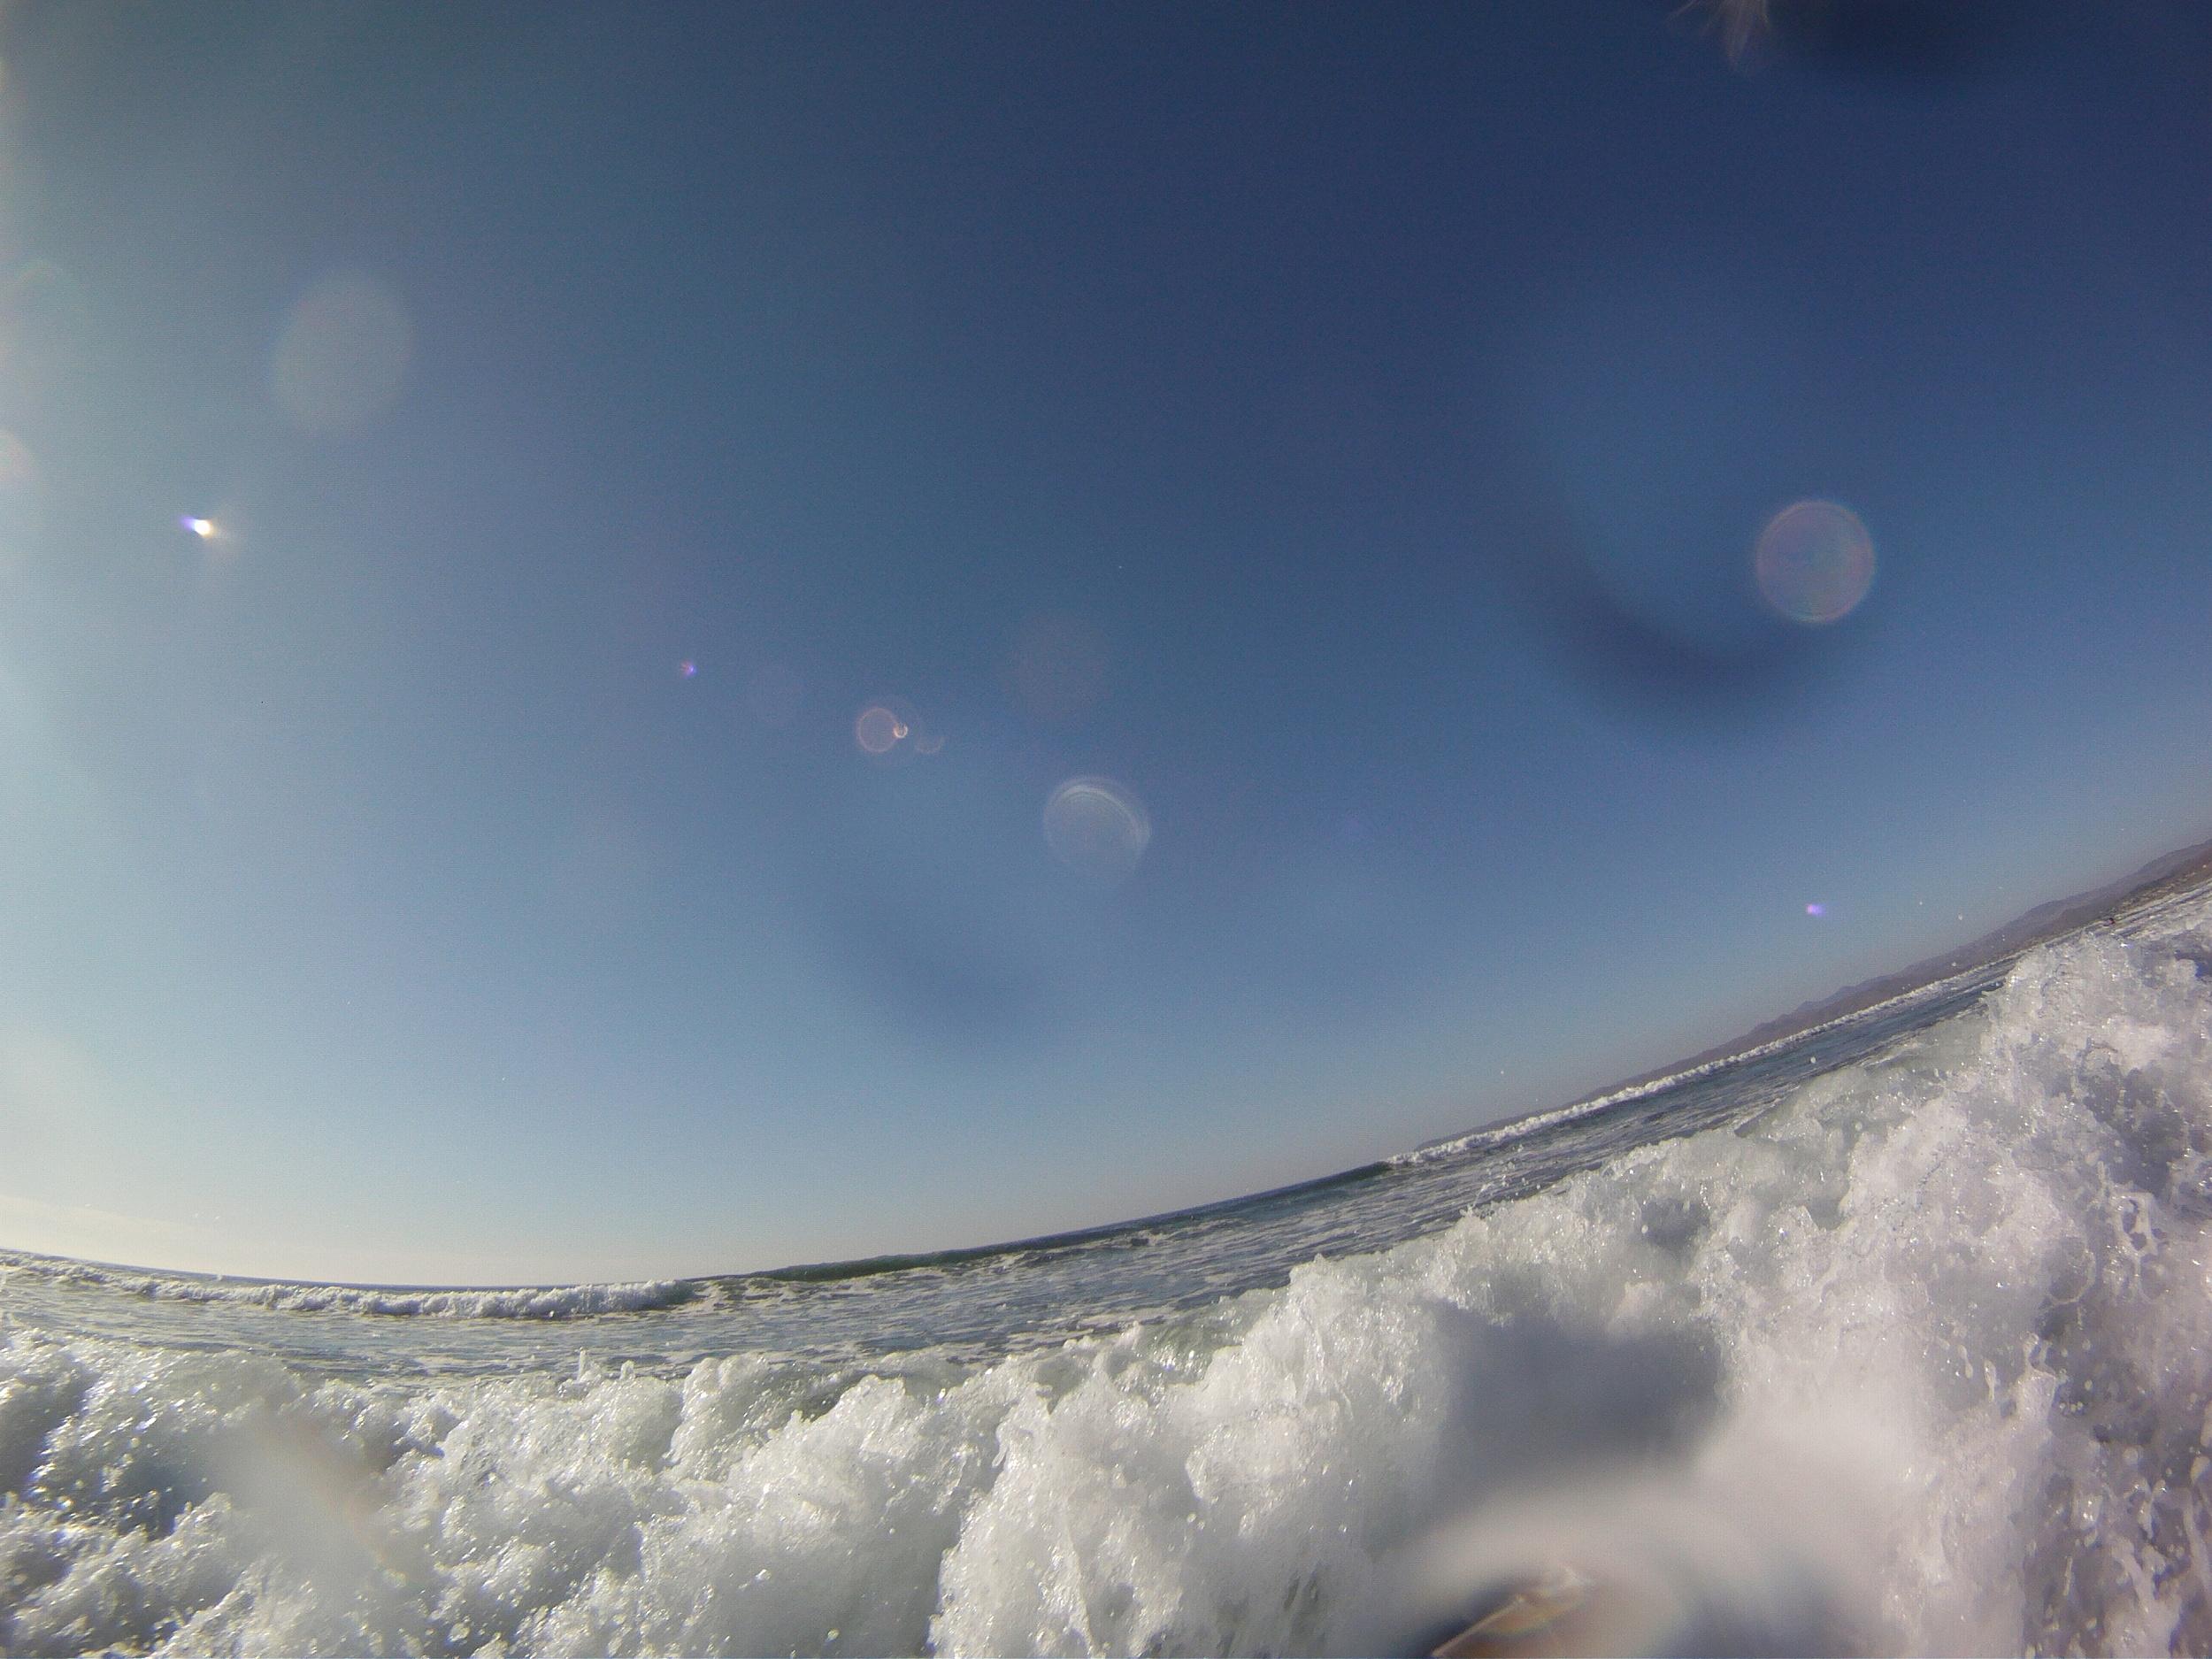 surf-swell-morro-bay.jpg